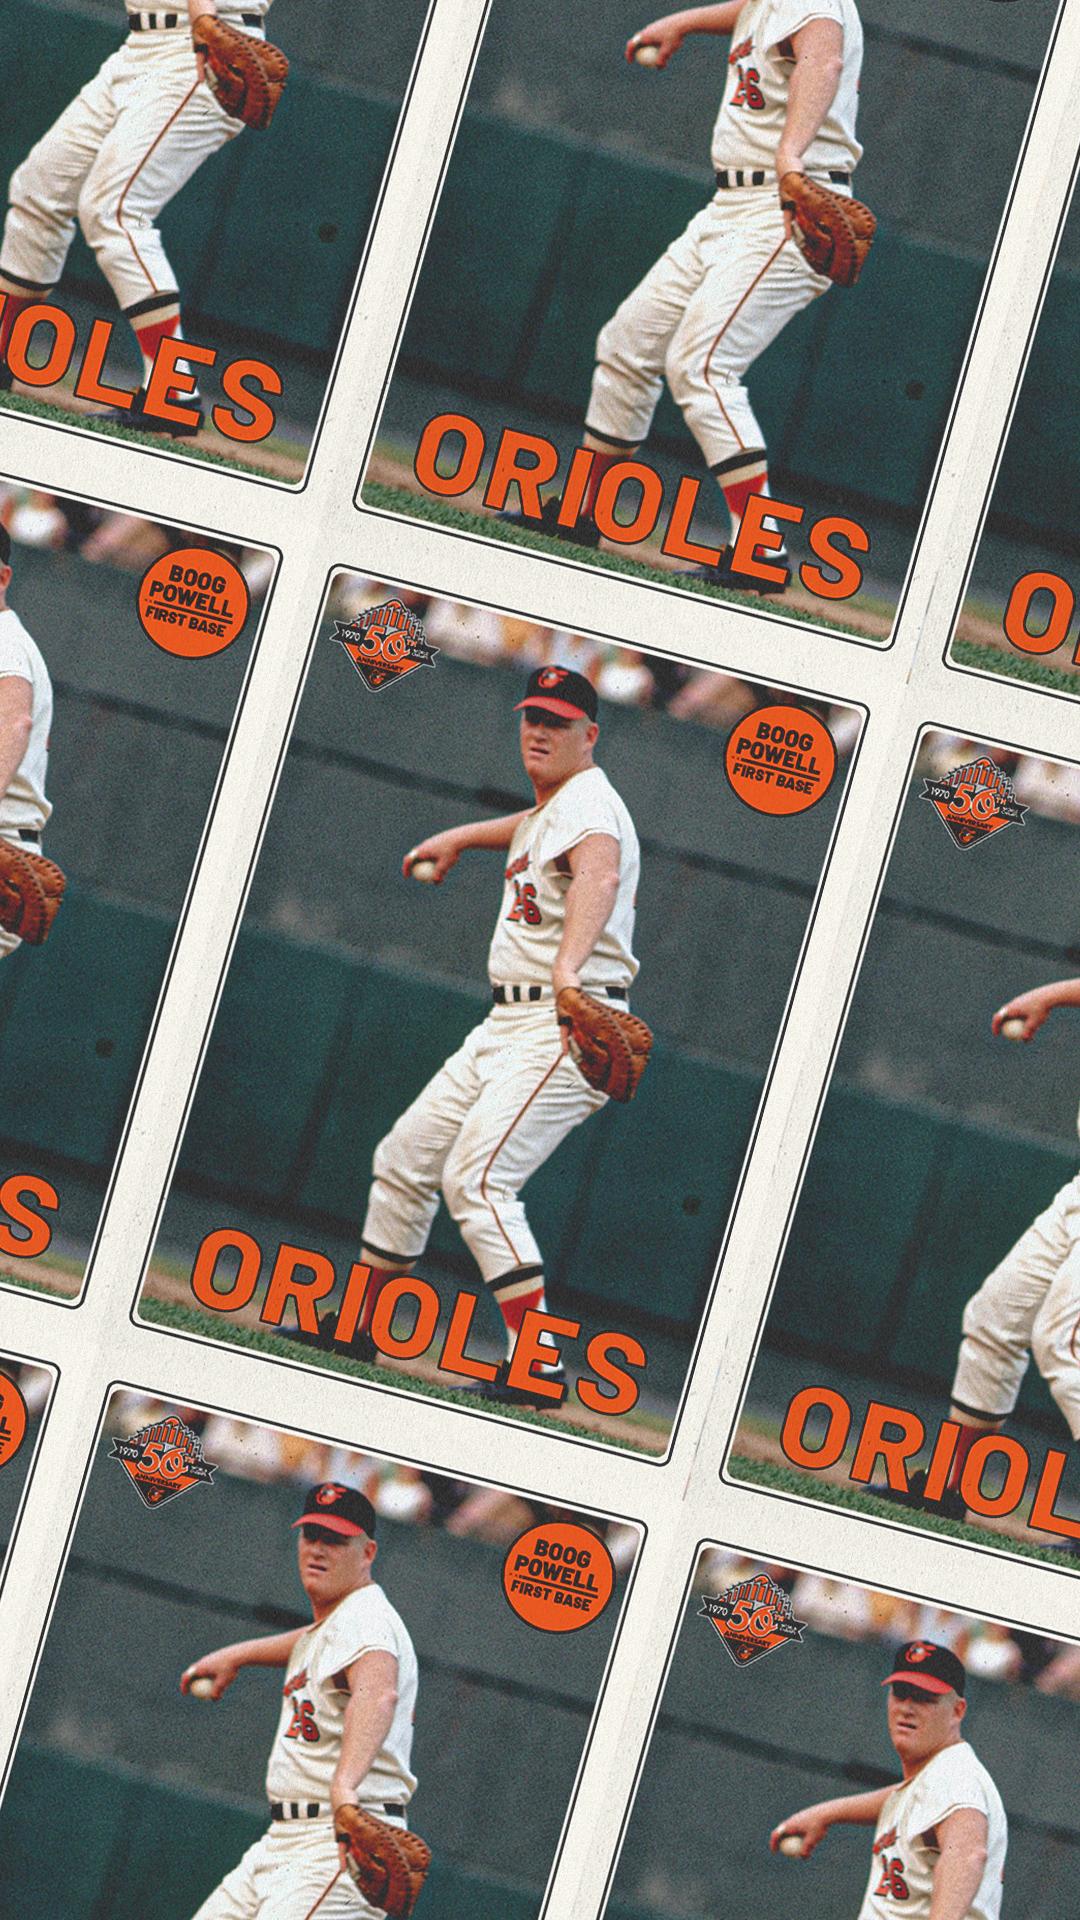 Wallpaper Wednesday Fans Baltimore Orioles 1080x1920